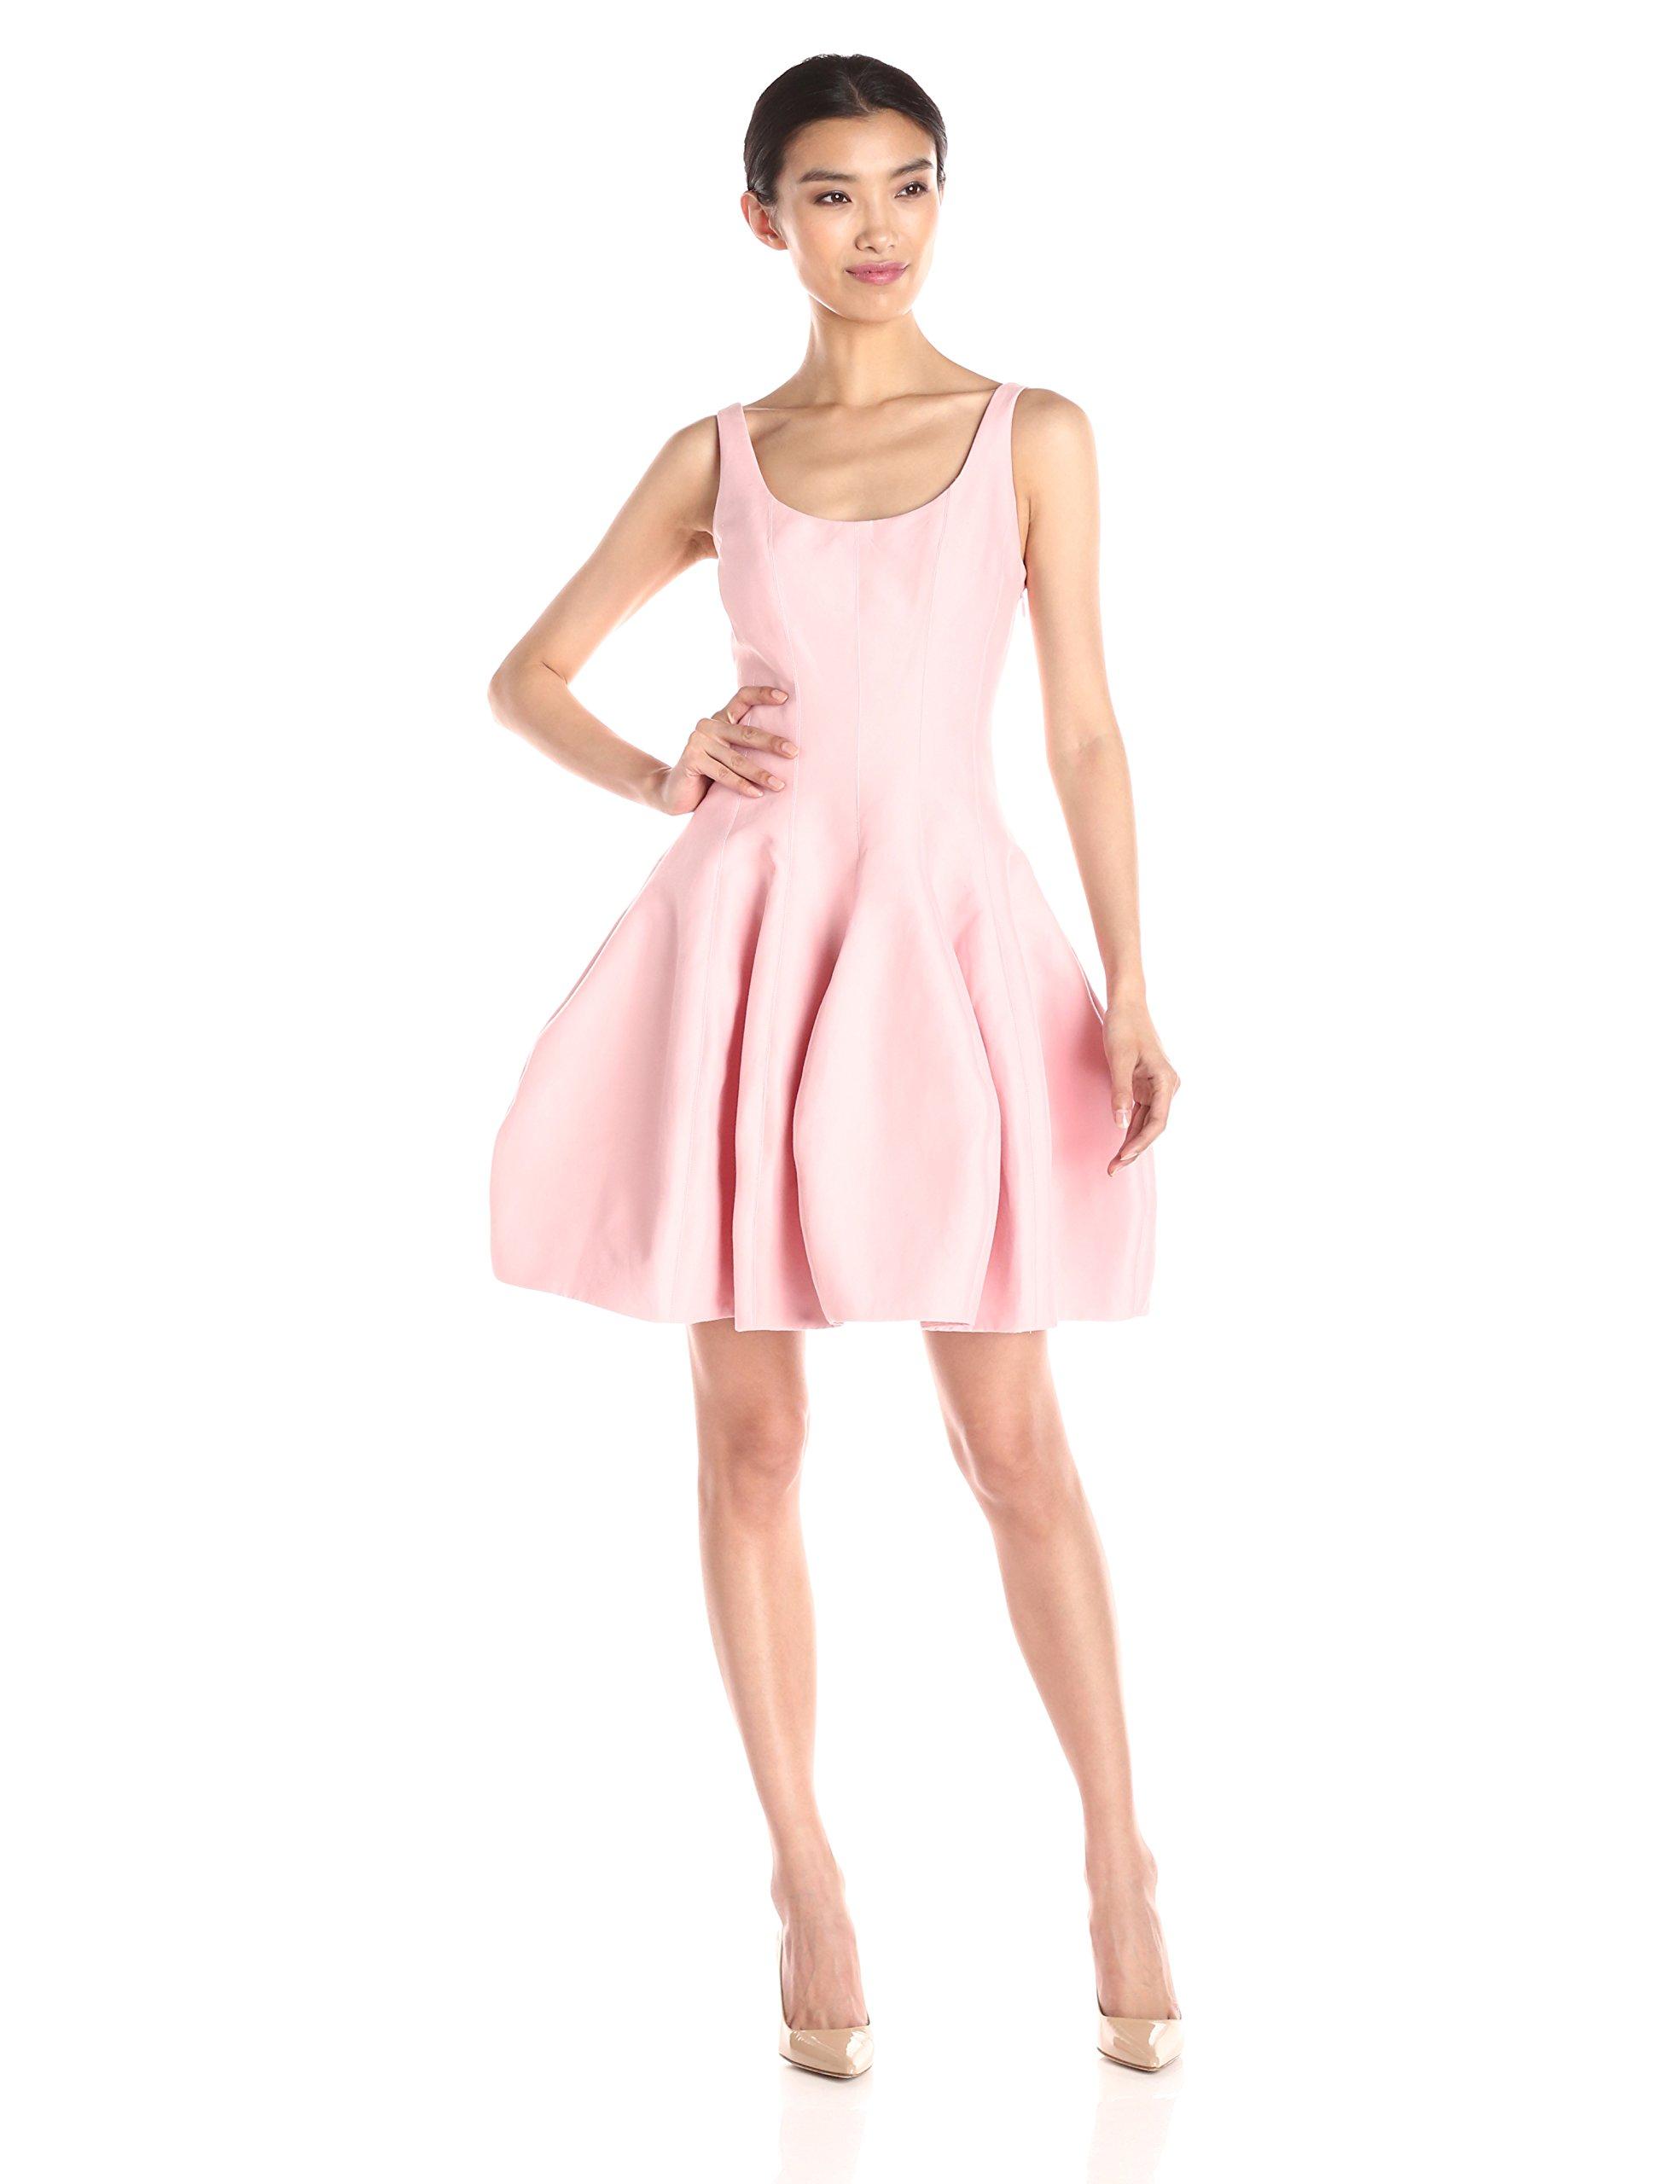 HALSTON HERITAGE Women's Sleeveless Dress with Structured Tulip Skirt, Lotus, 2